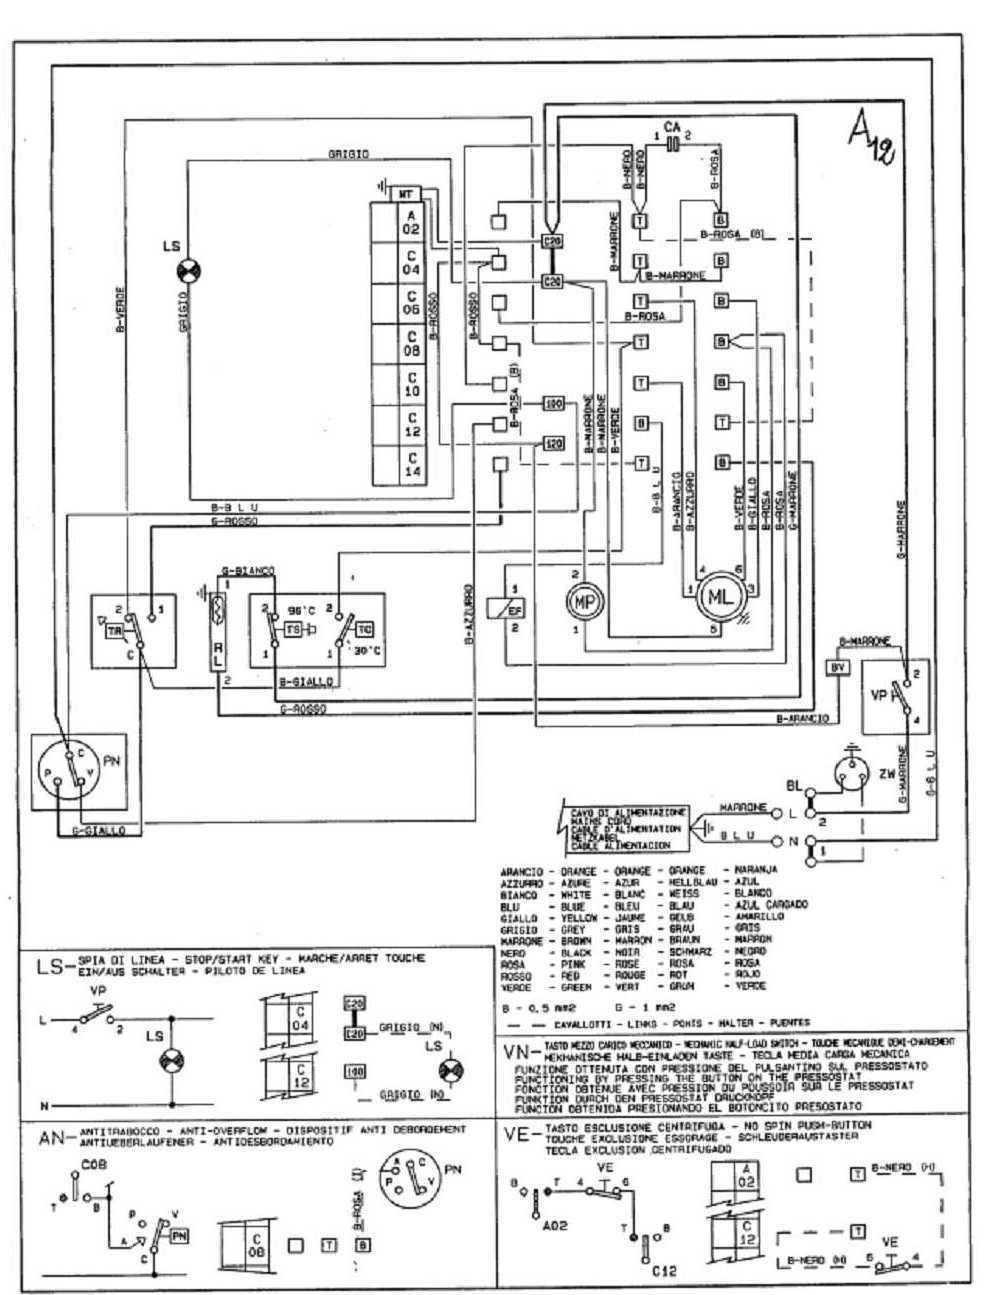 Lavarropas whirlpool awg 258 manual dexterity